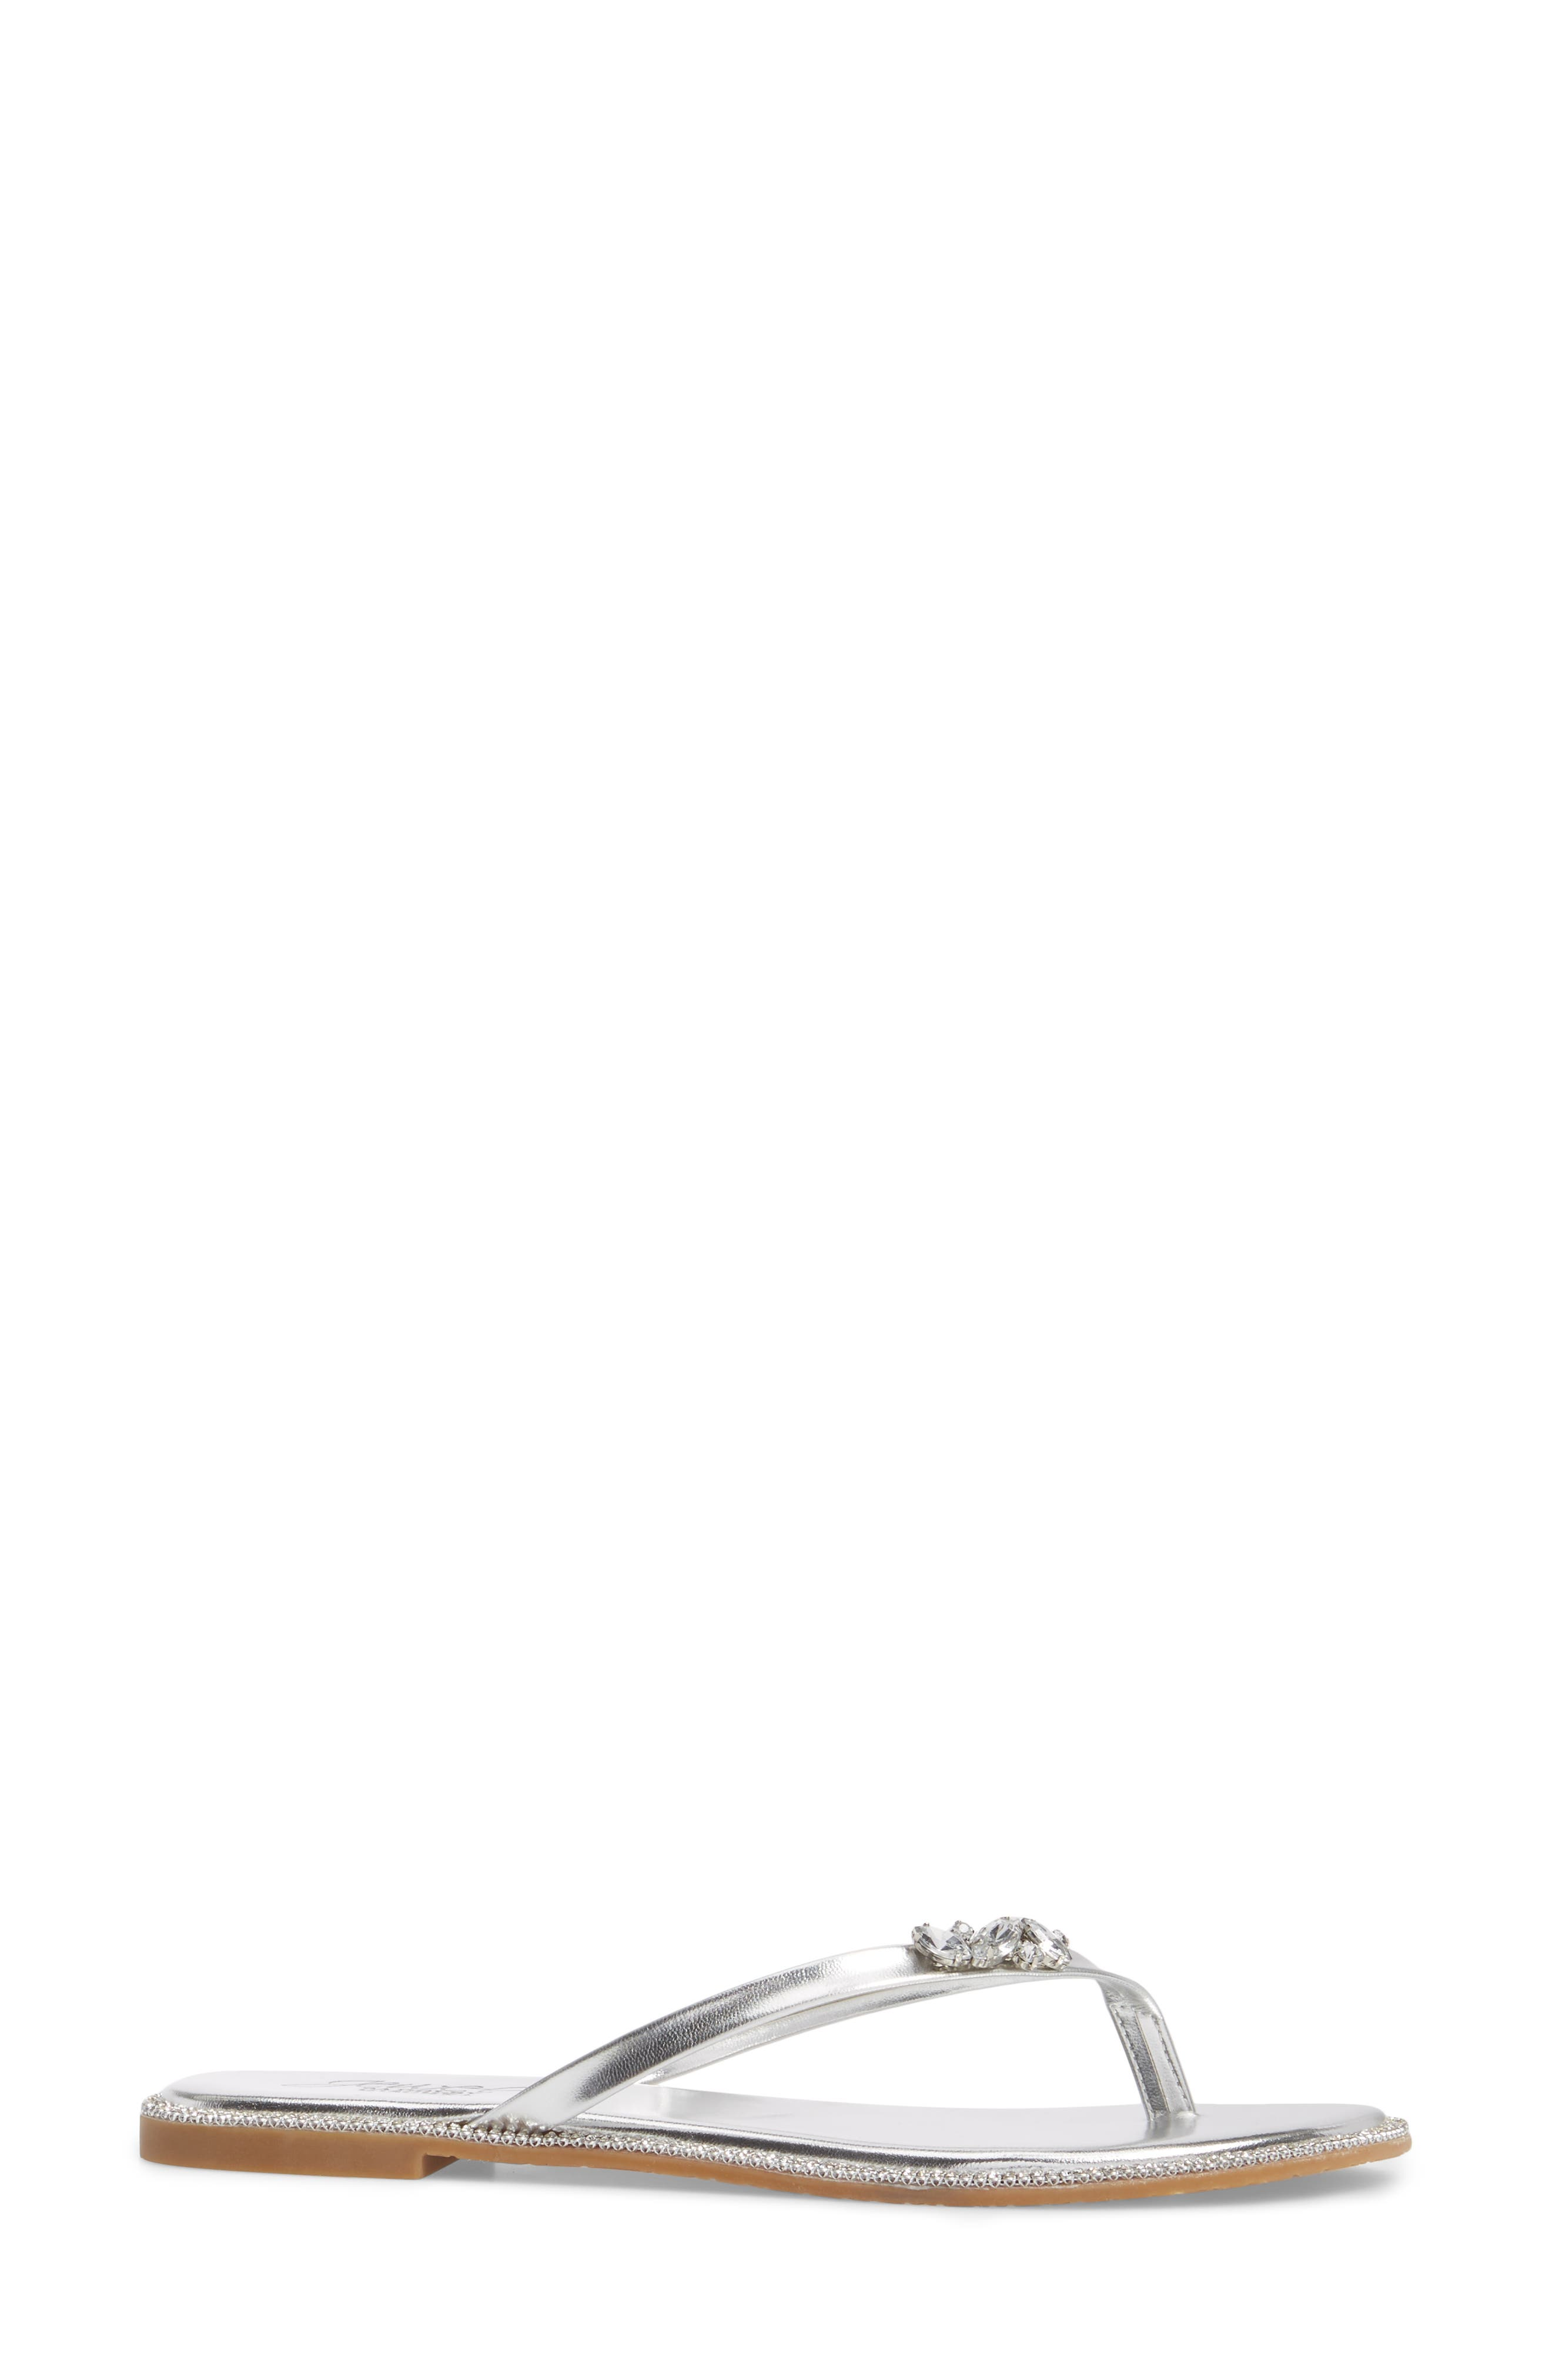 Thalia Crystal Embellished Flip Flop,                             Alternate thumbnail 3, color,                             Silver Leather